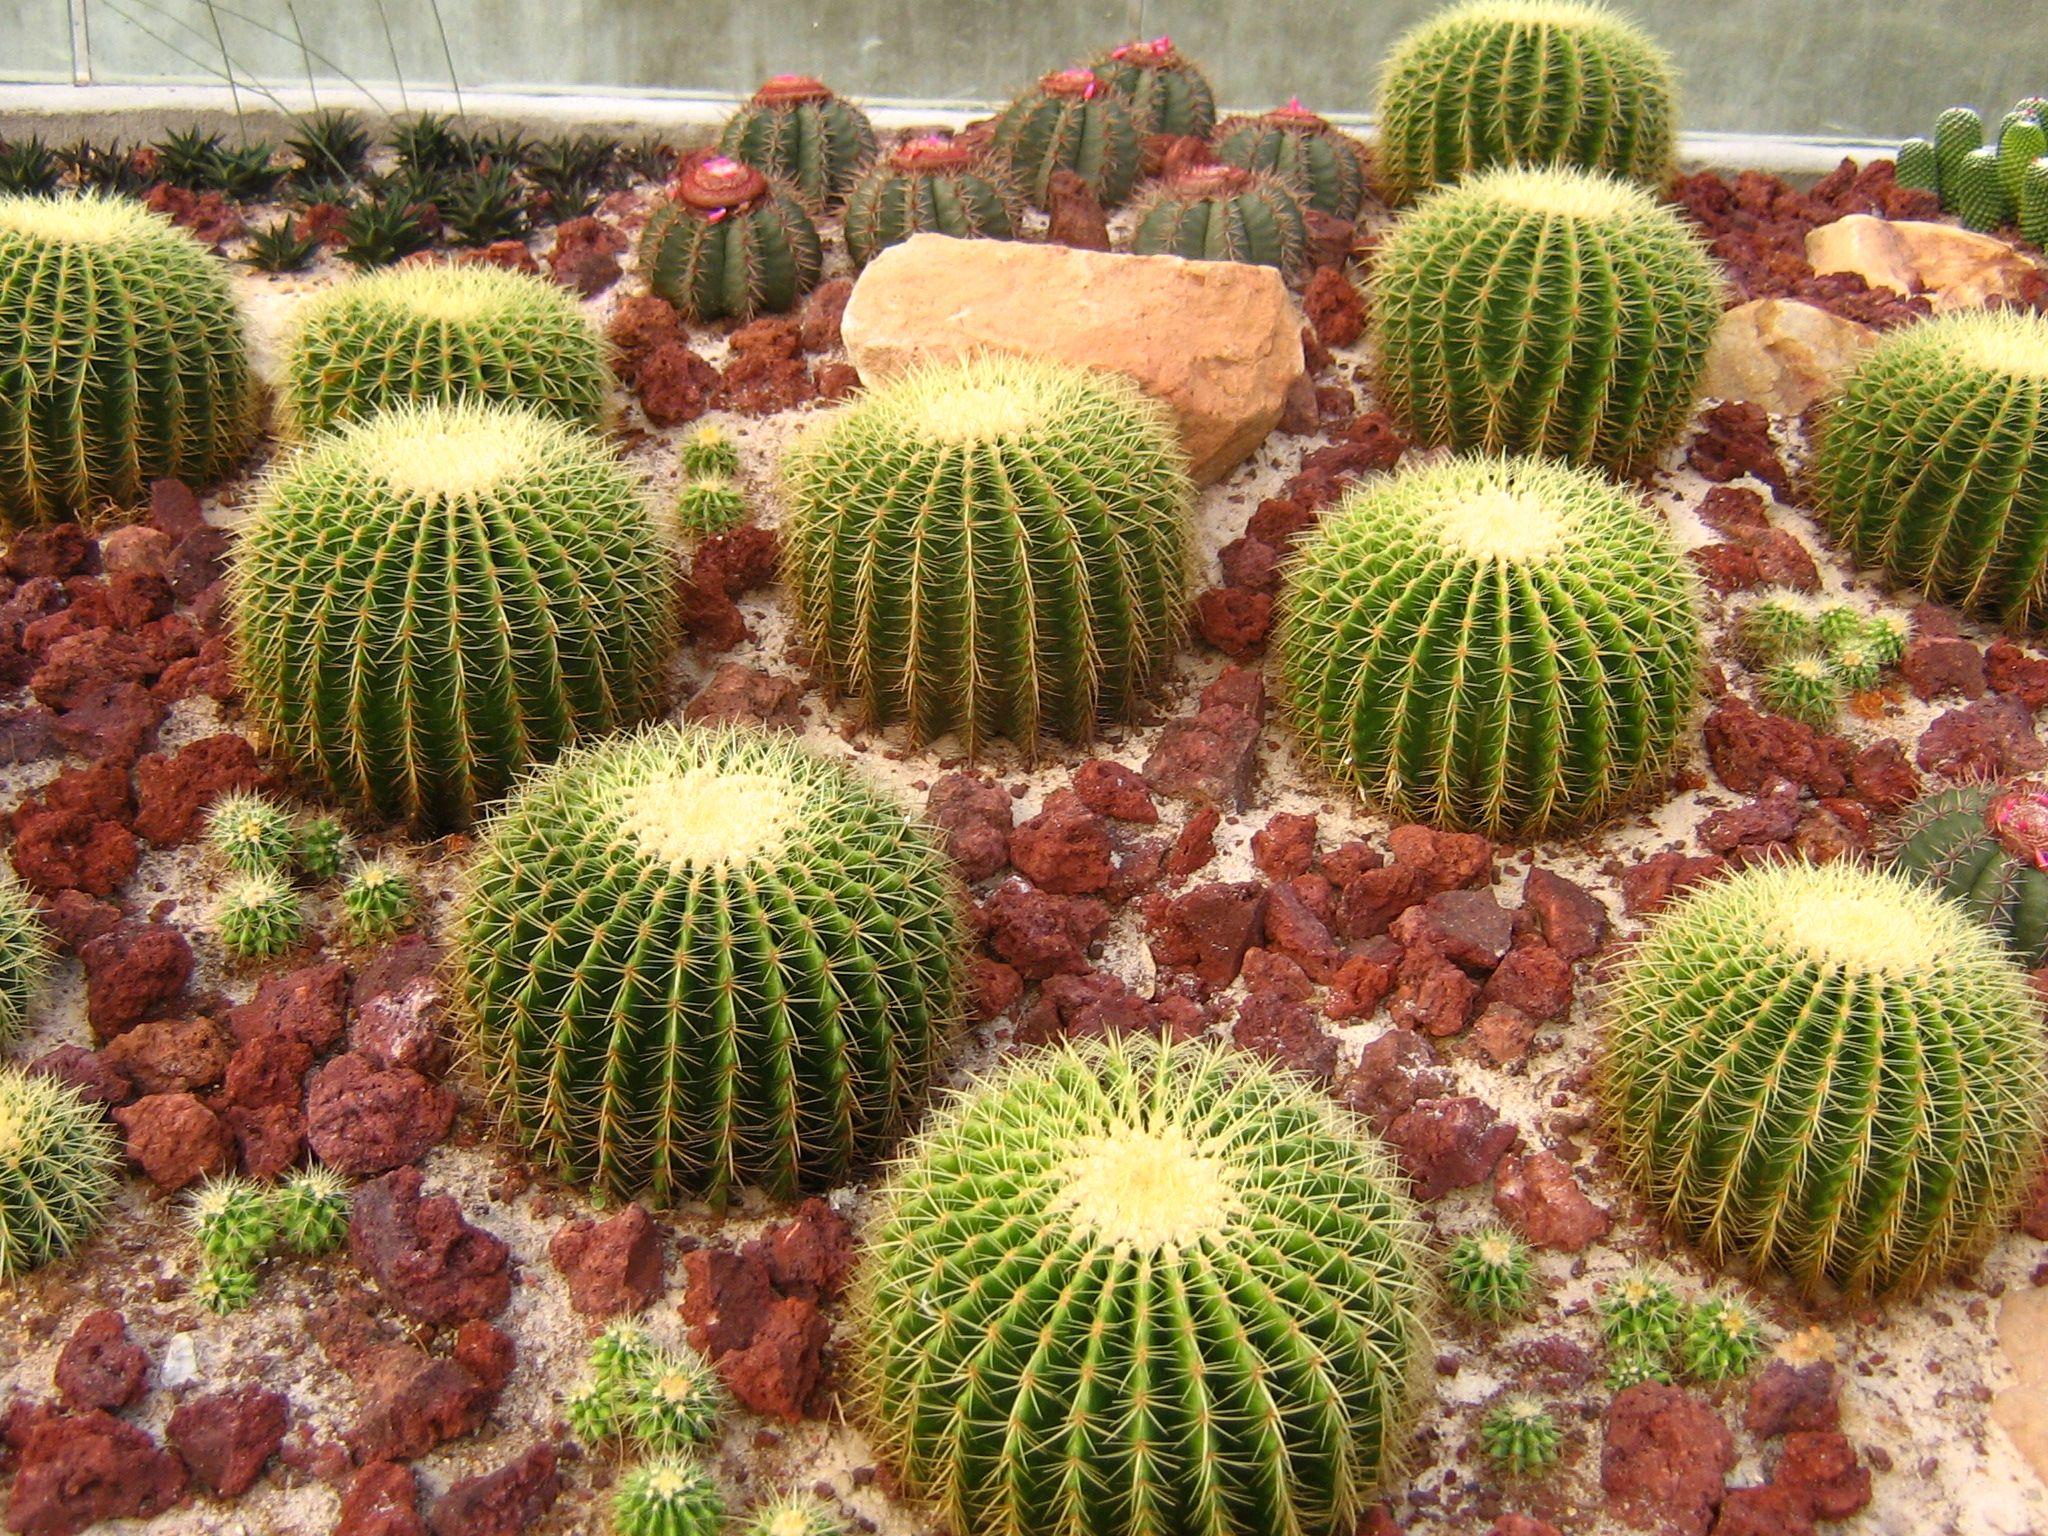 cactus | Dream Home | Pinterest | Cacti, Gardens and Barrel cactus